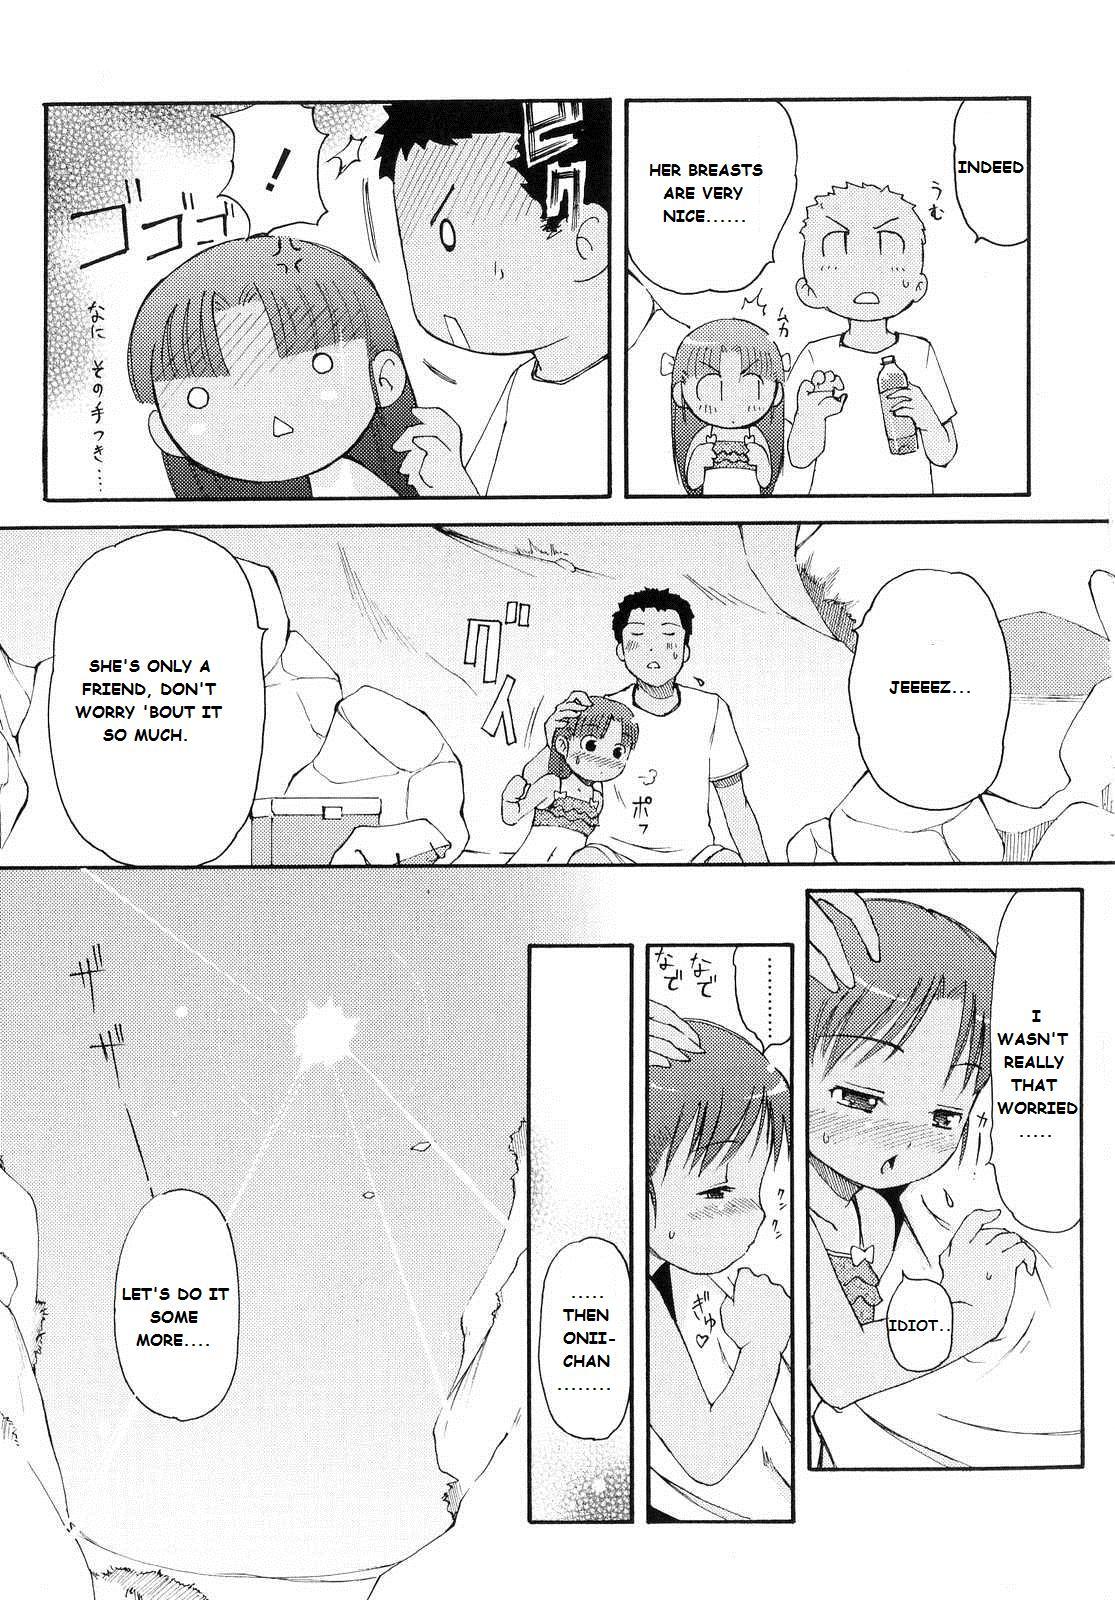 [LEE] Totsugeki Tonari no Onii-chan Ch. 1-7 [ENG] 15